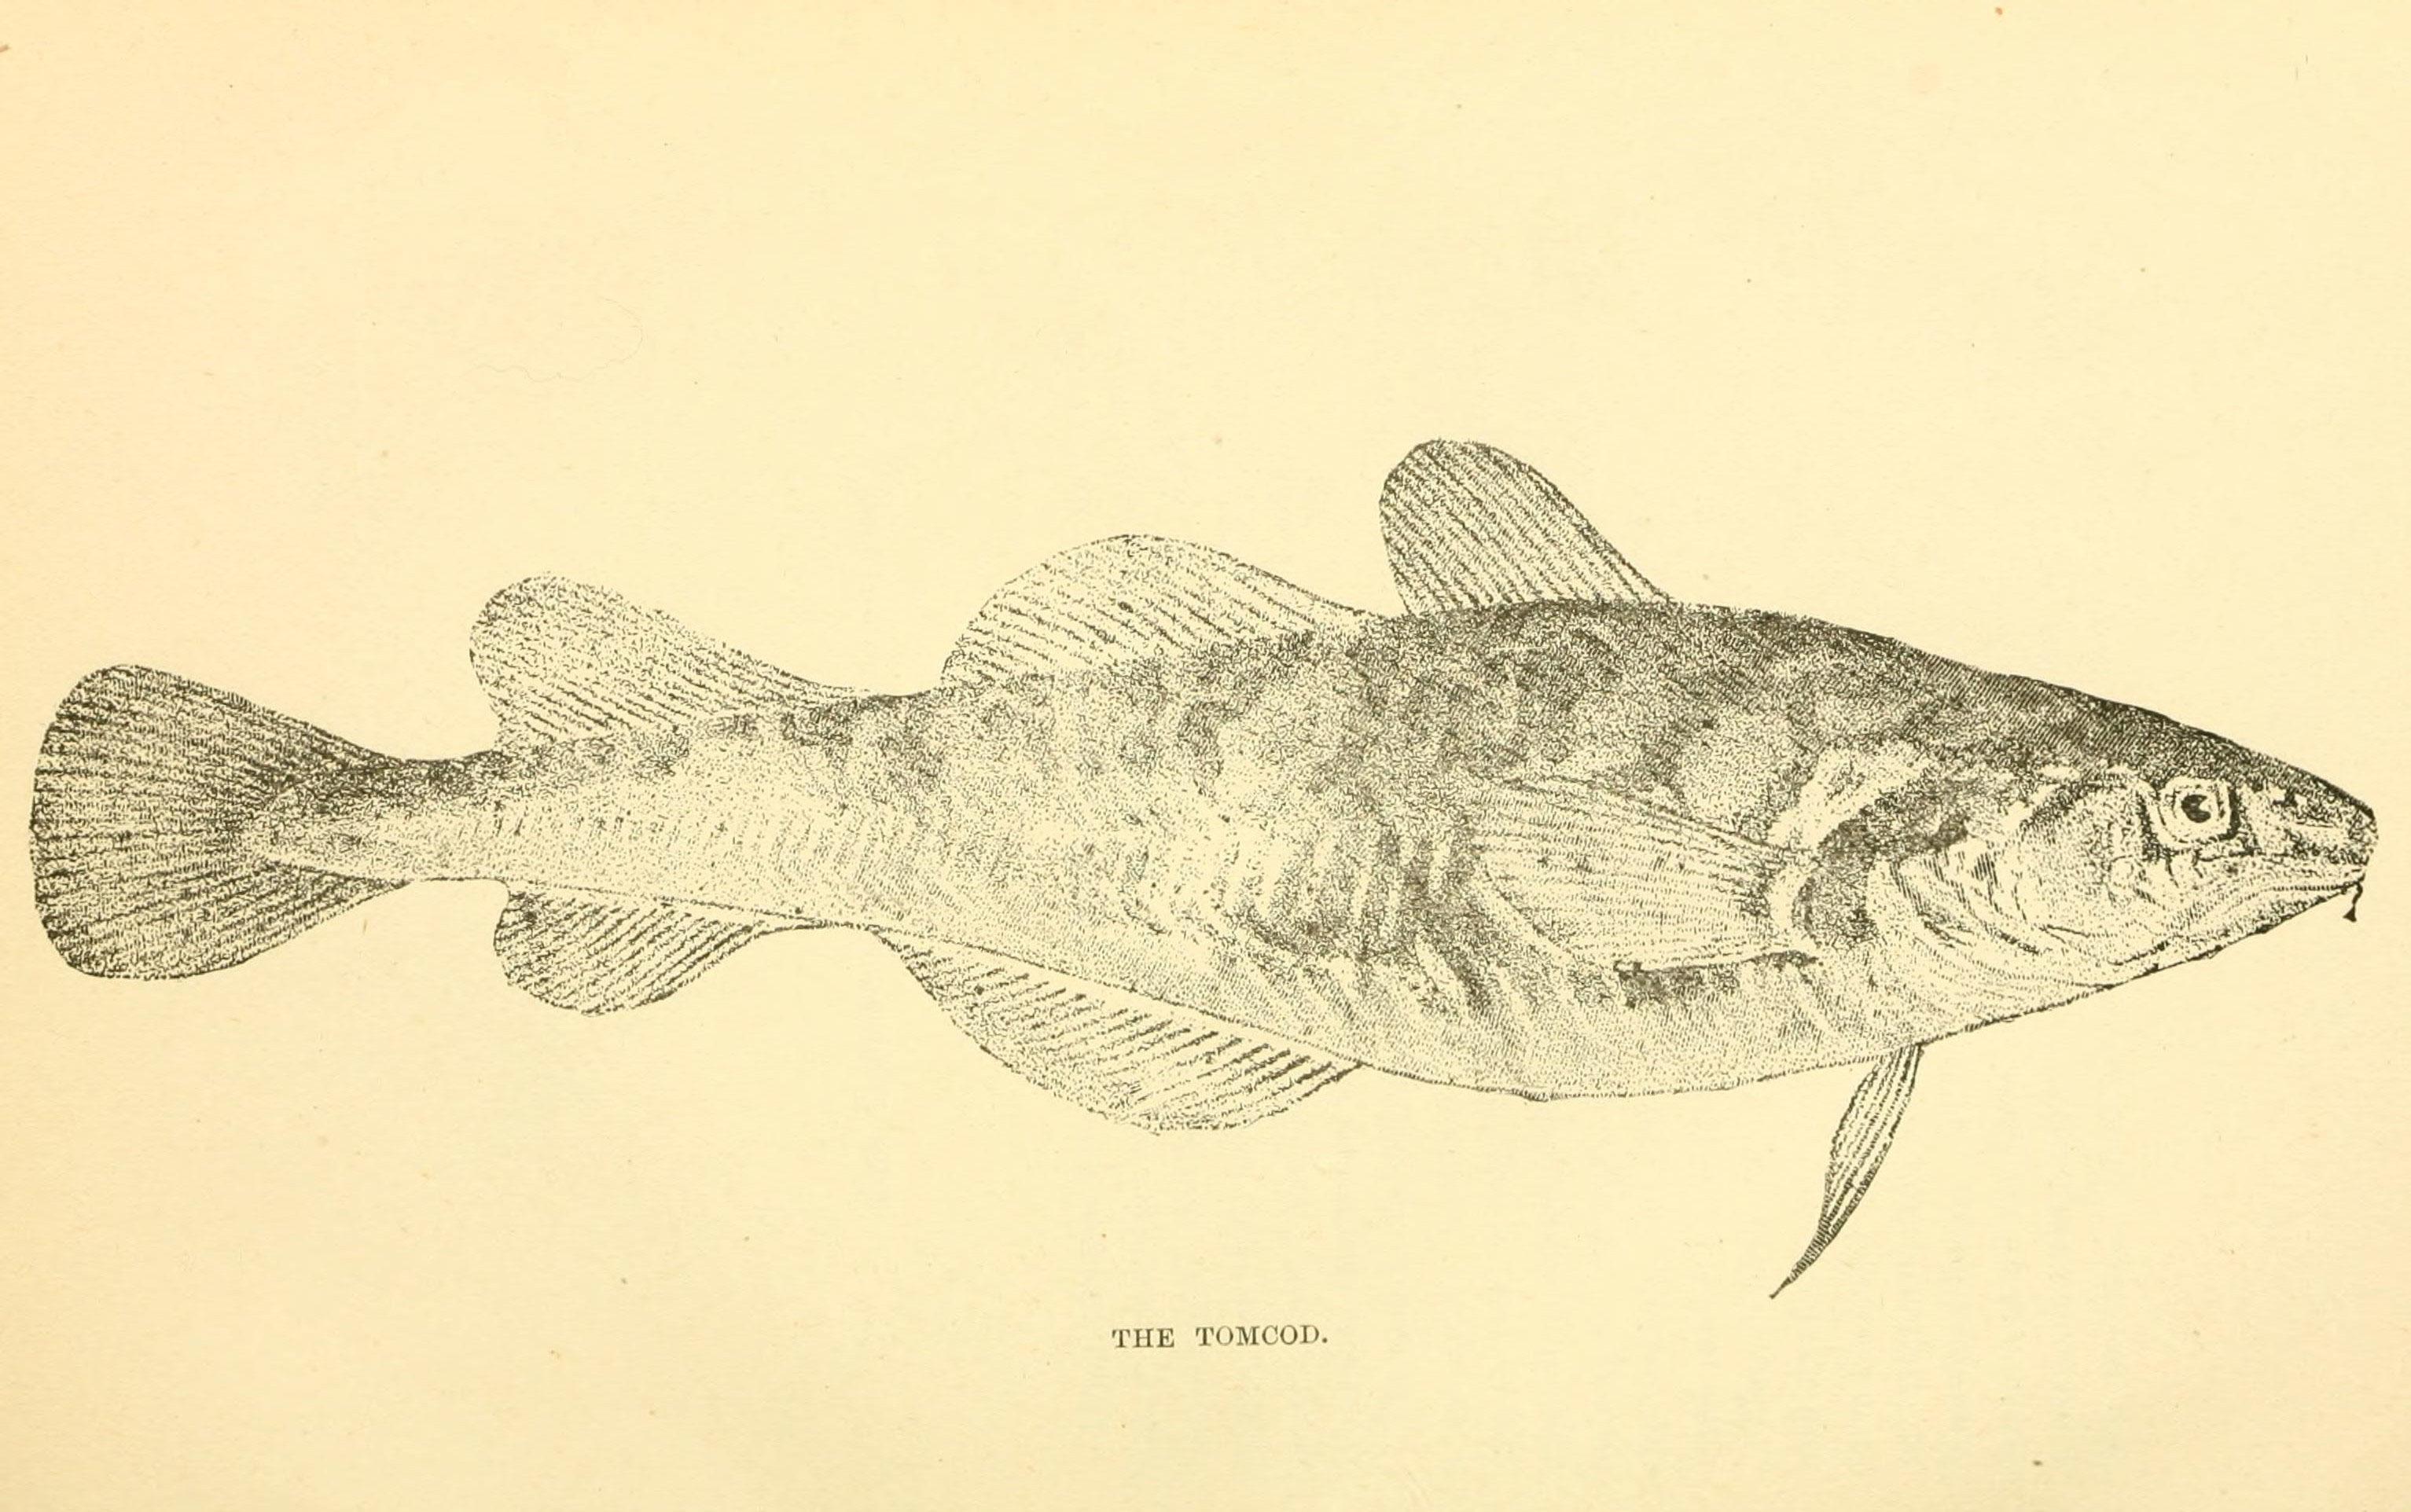 Image of Atlantic Tomcod